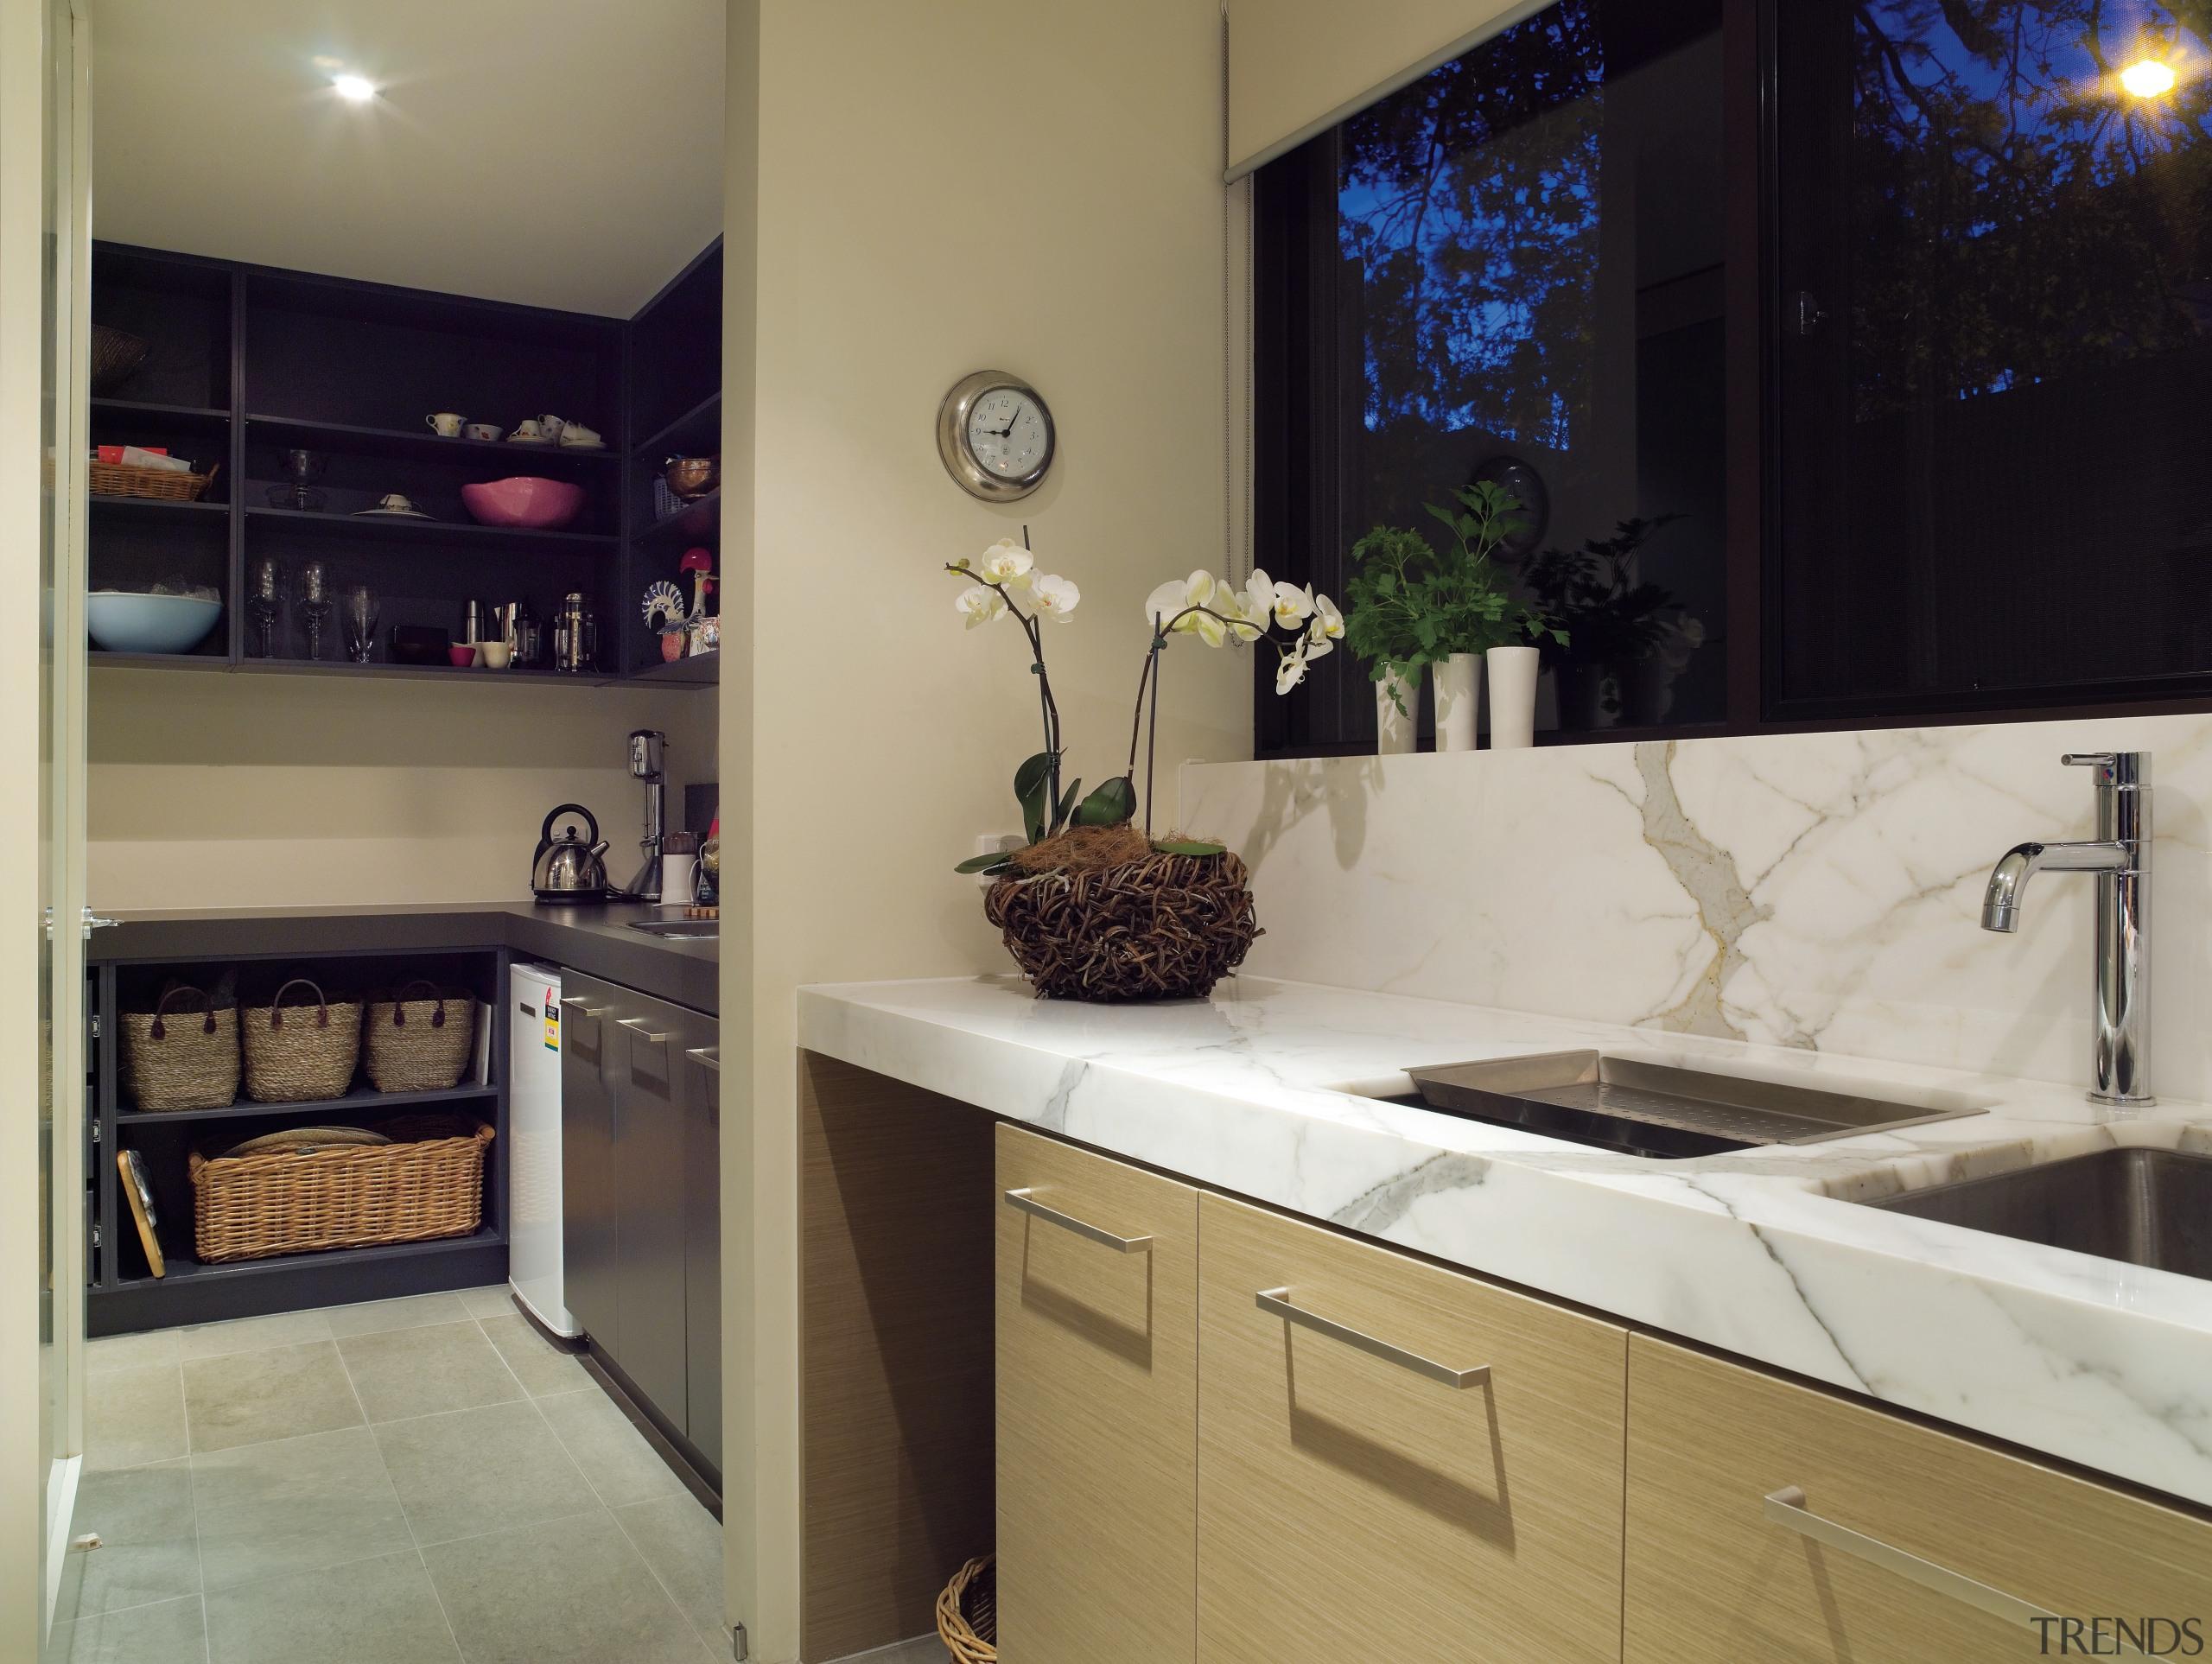 A view of this kitchen featuring clalcutta marble countertop, interior design, kitchen, room, gray, black